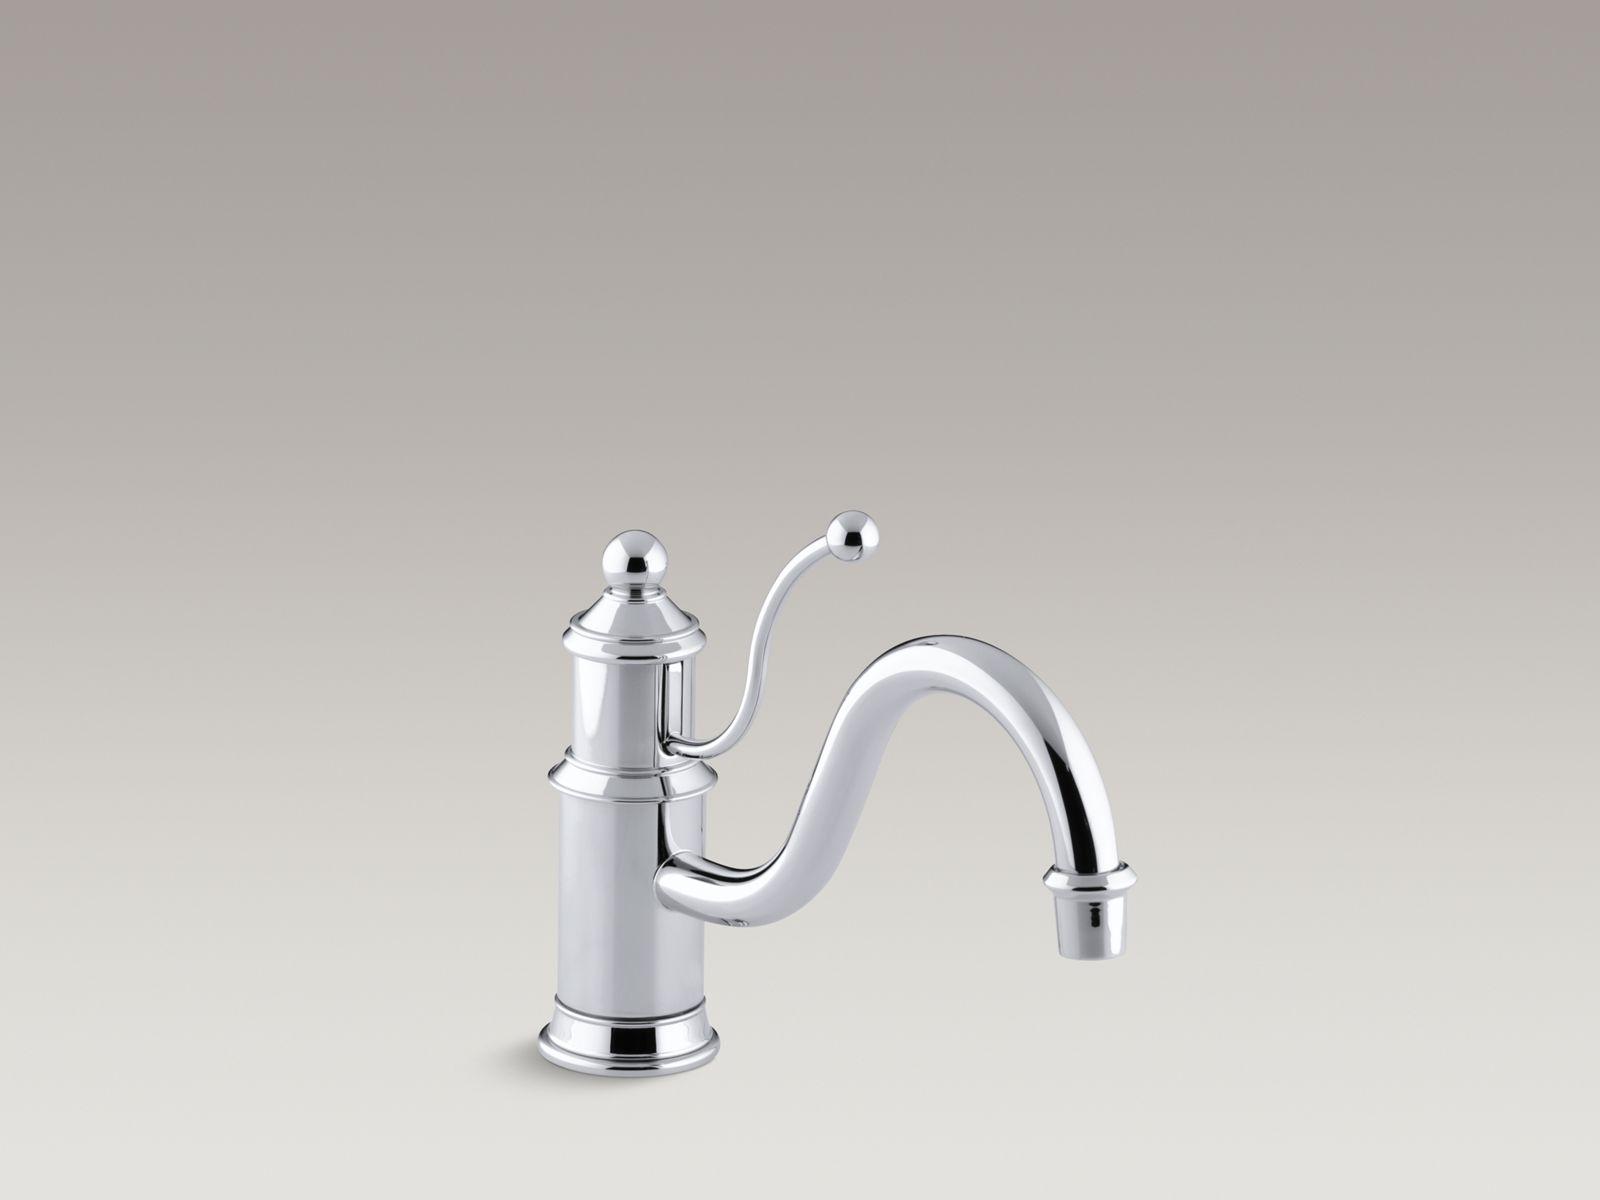 antique single handle kitchen sink